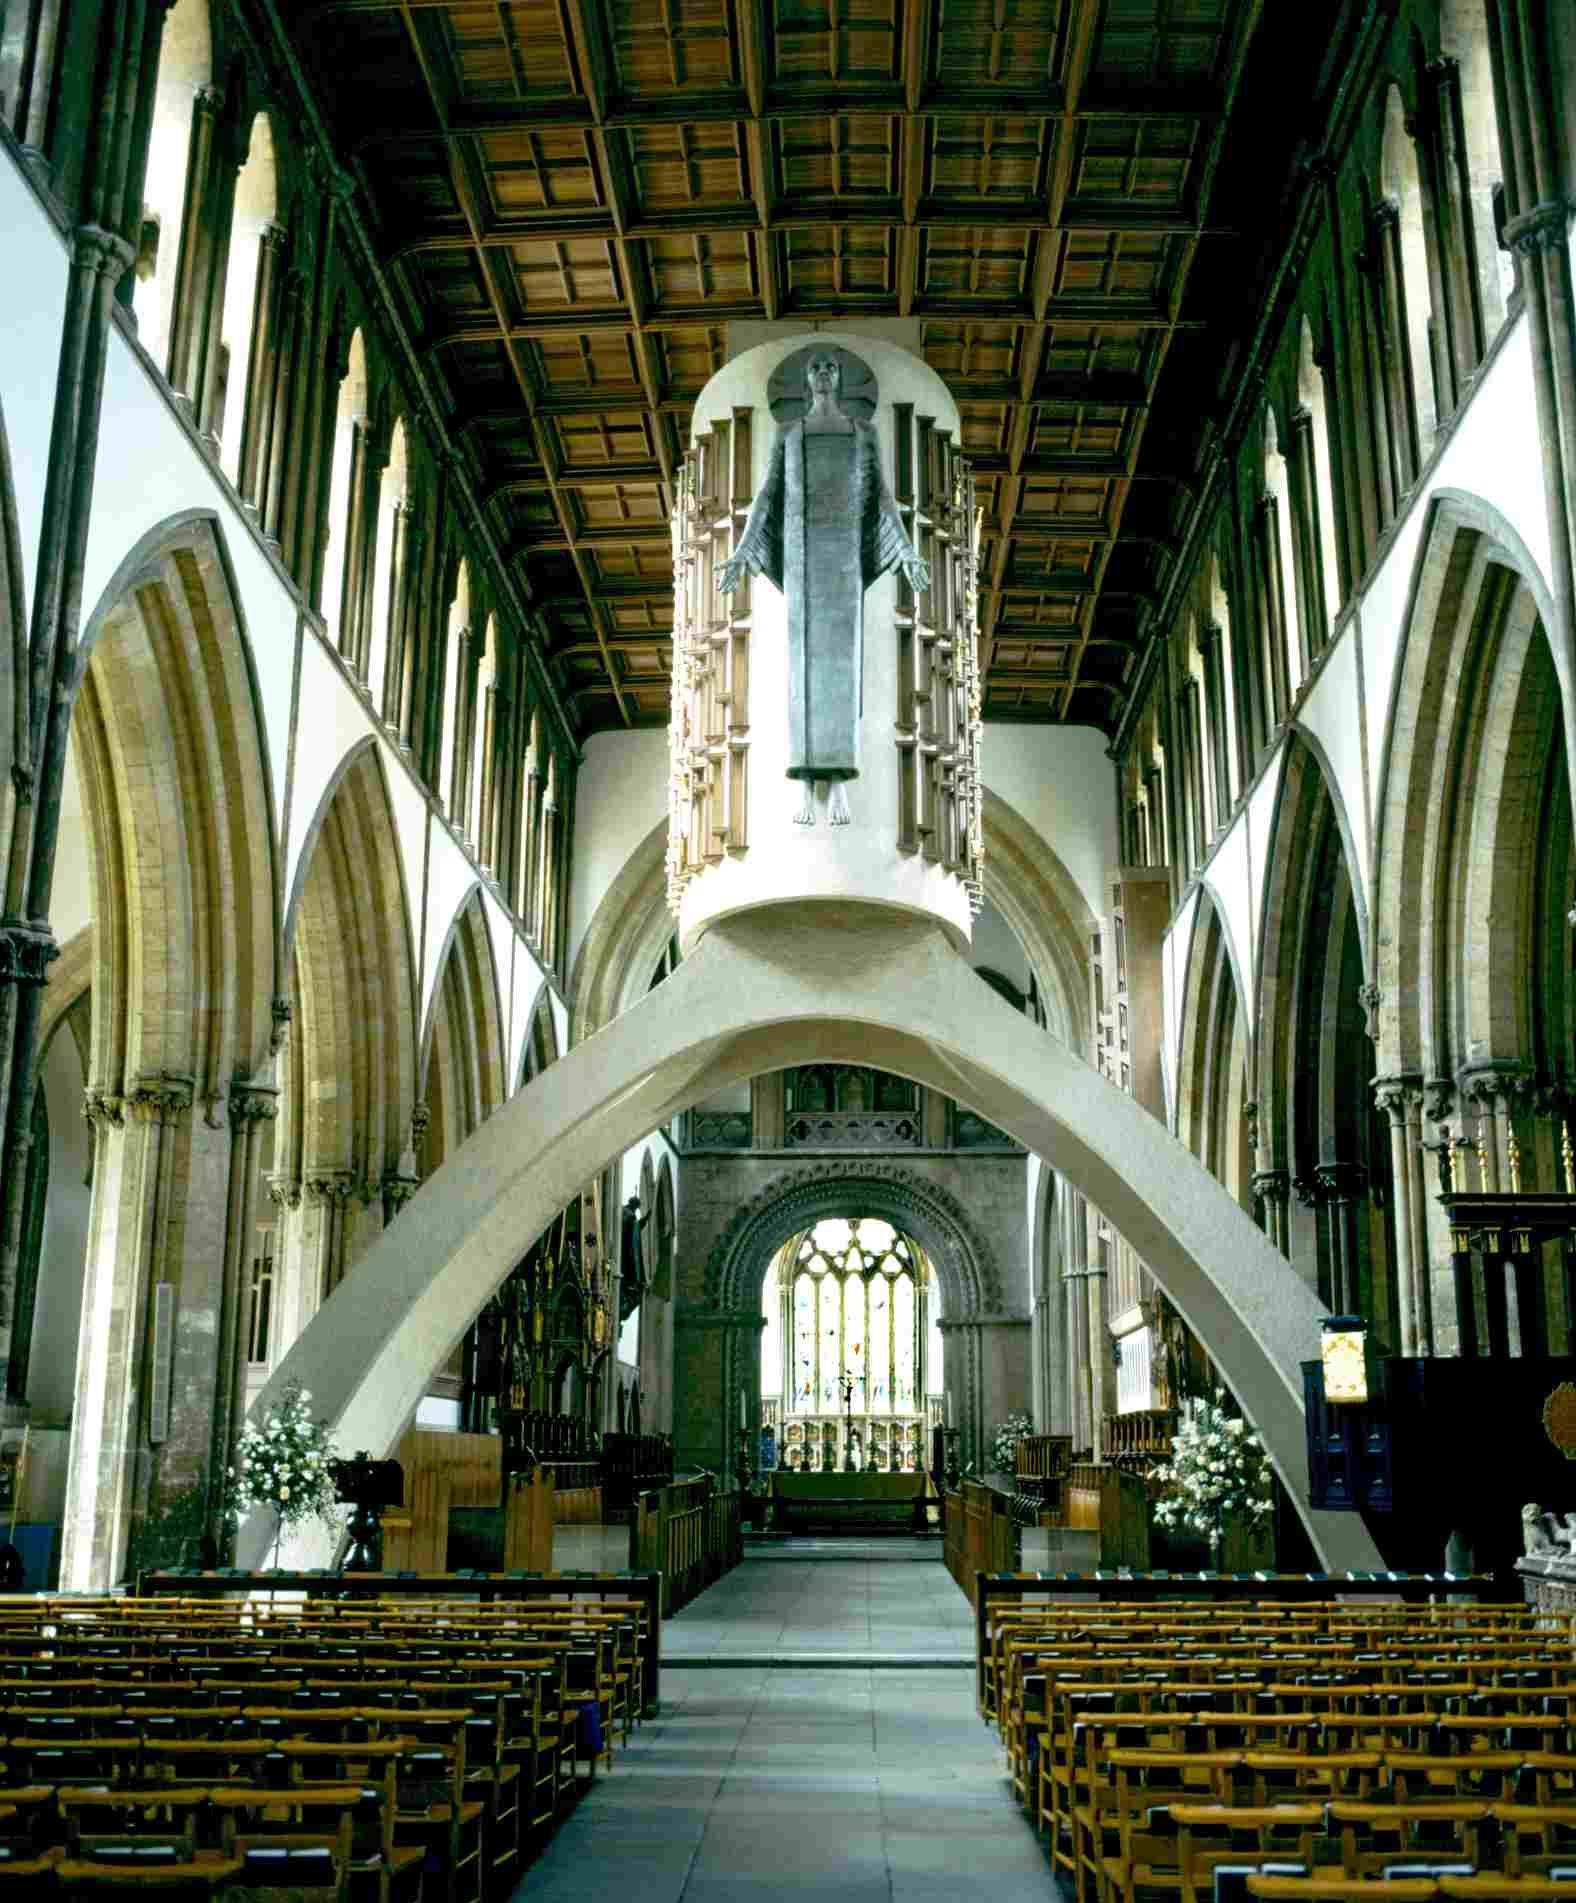 Jacob Epstein's Majestas at Llandaff Cathedral